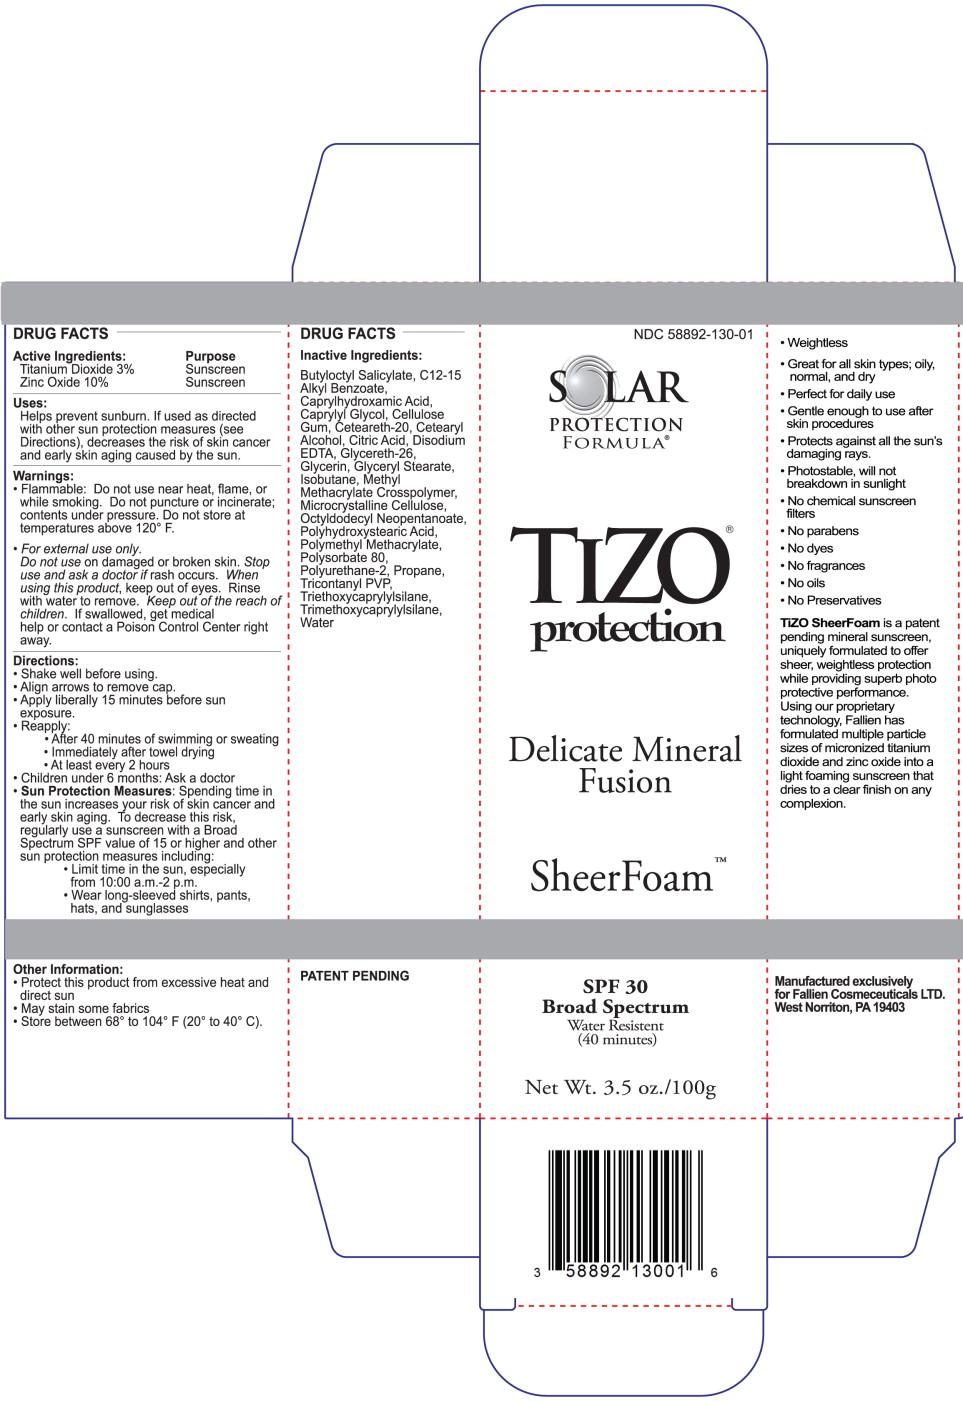 Principal Display Panel – 100g Carton Label